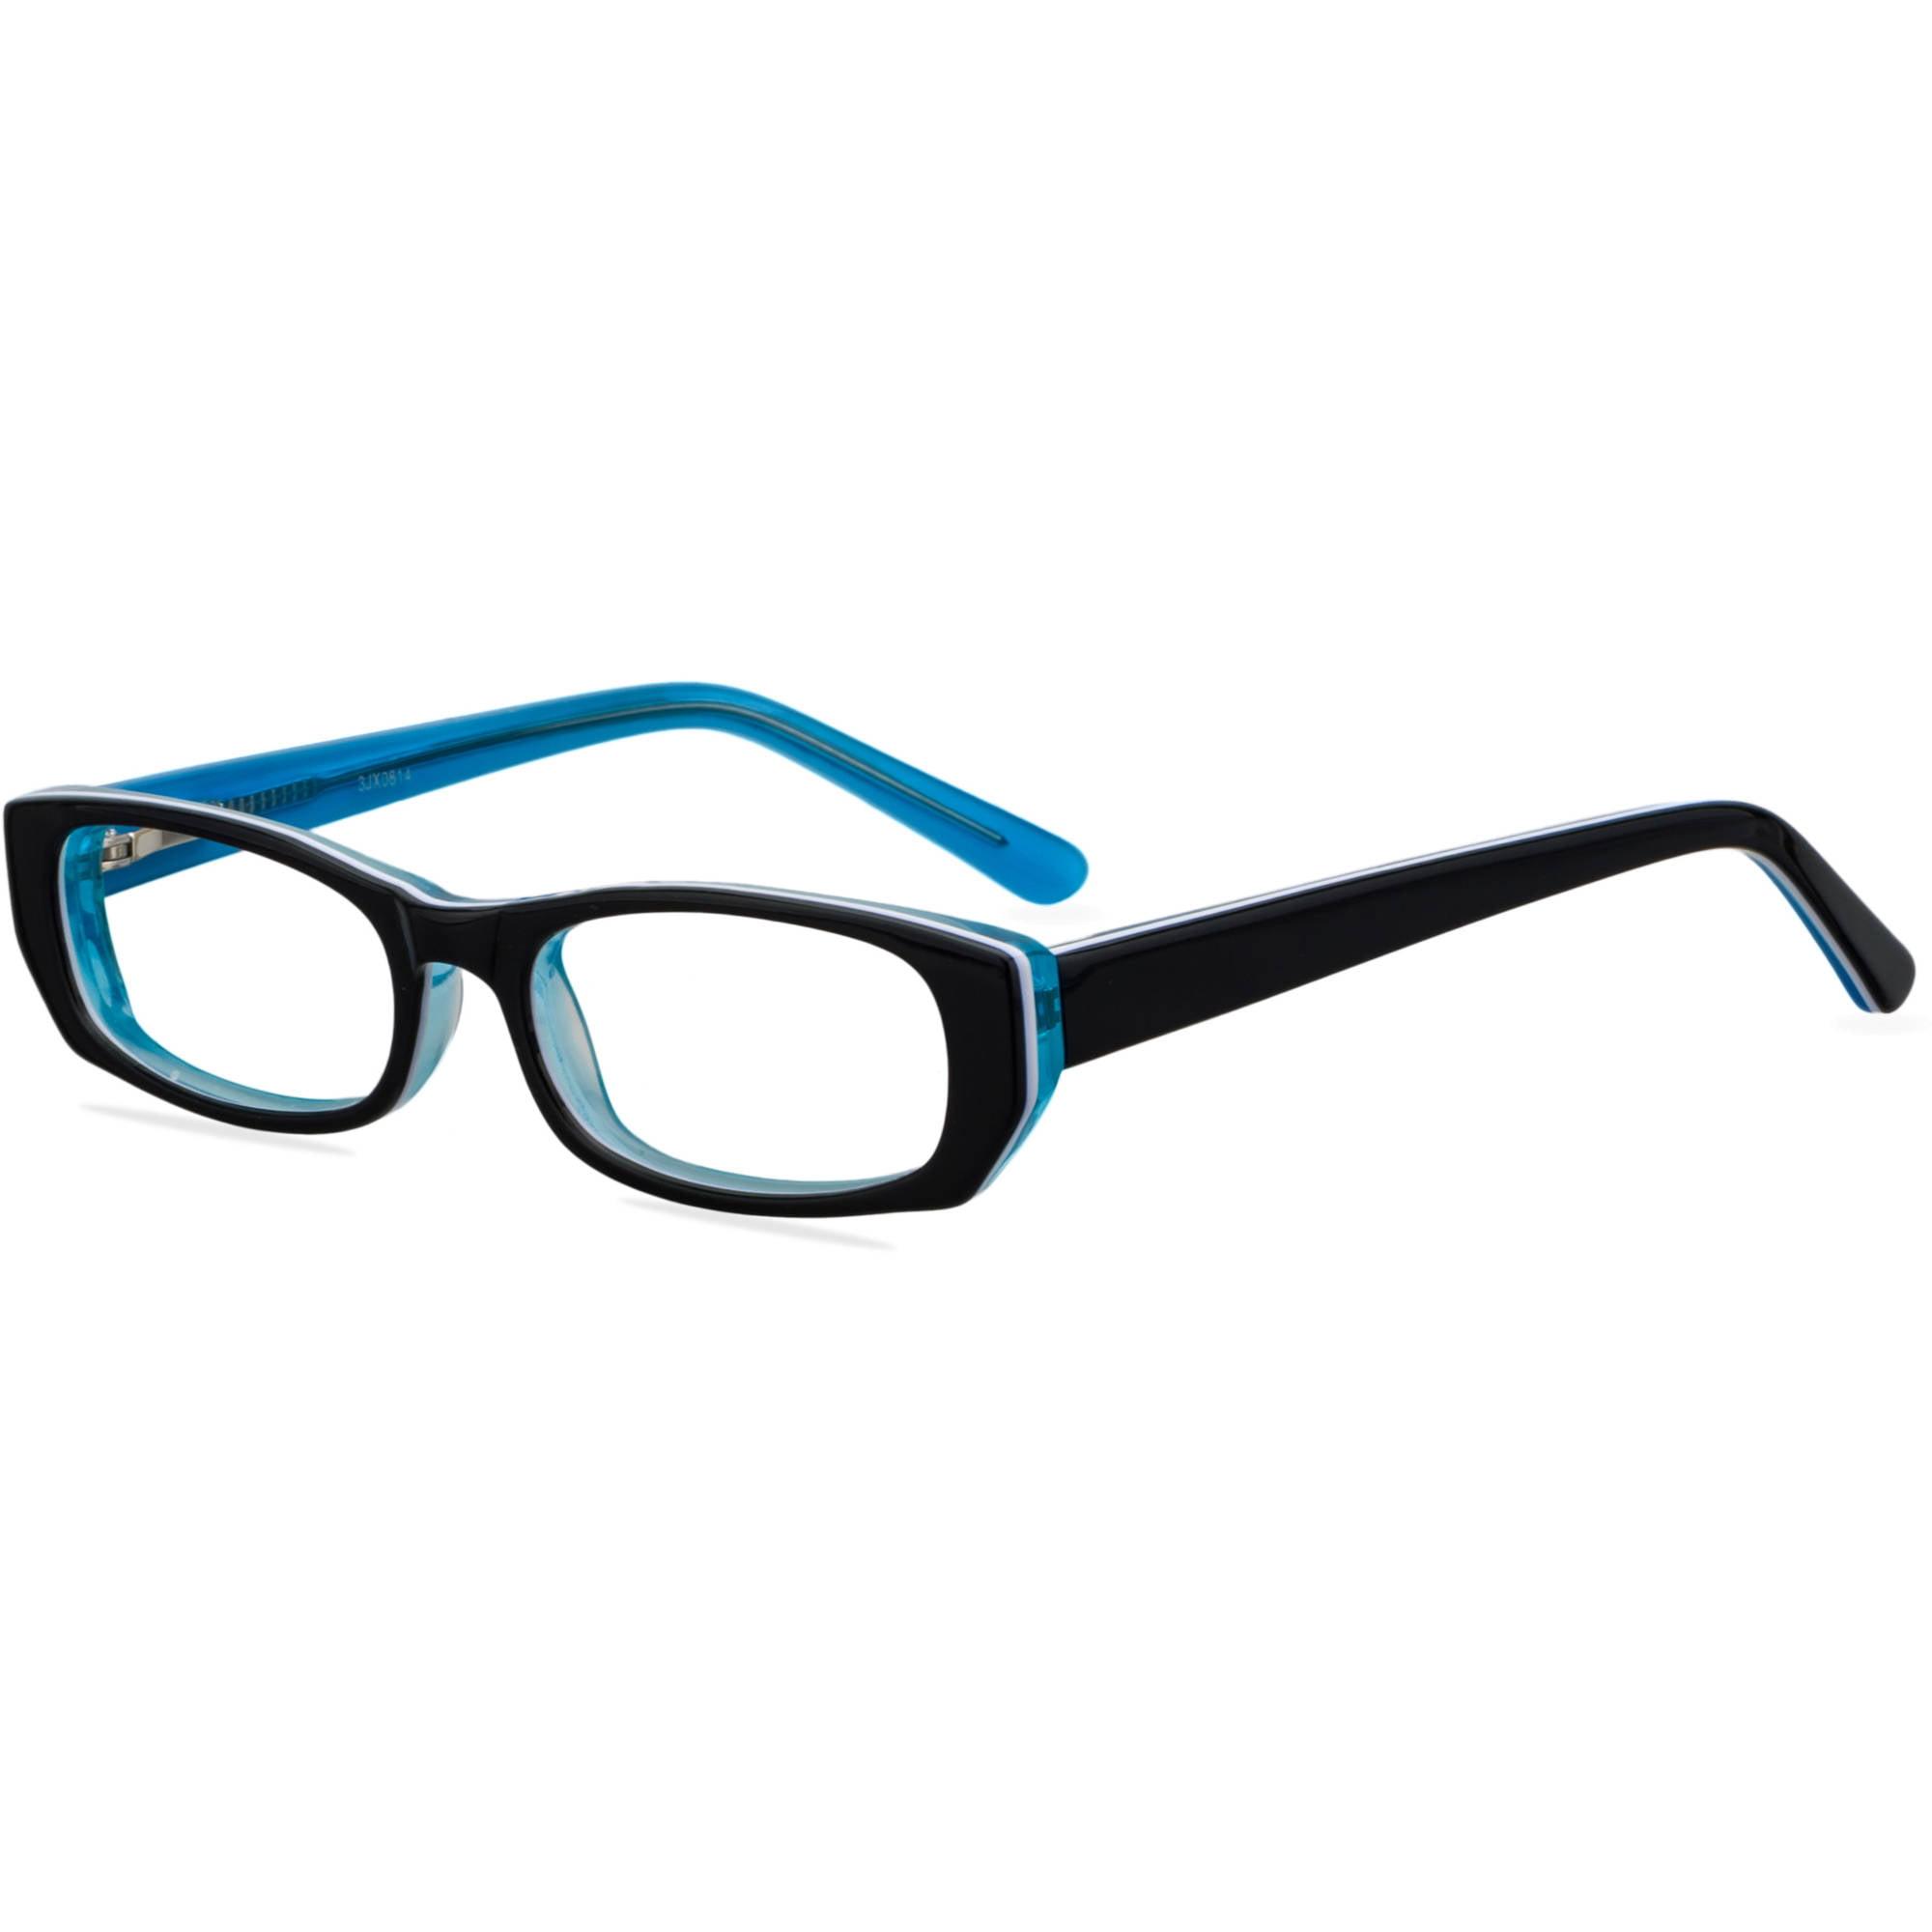 Baby Phat Prescription Eyeglasses